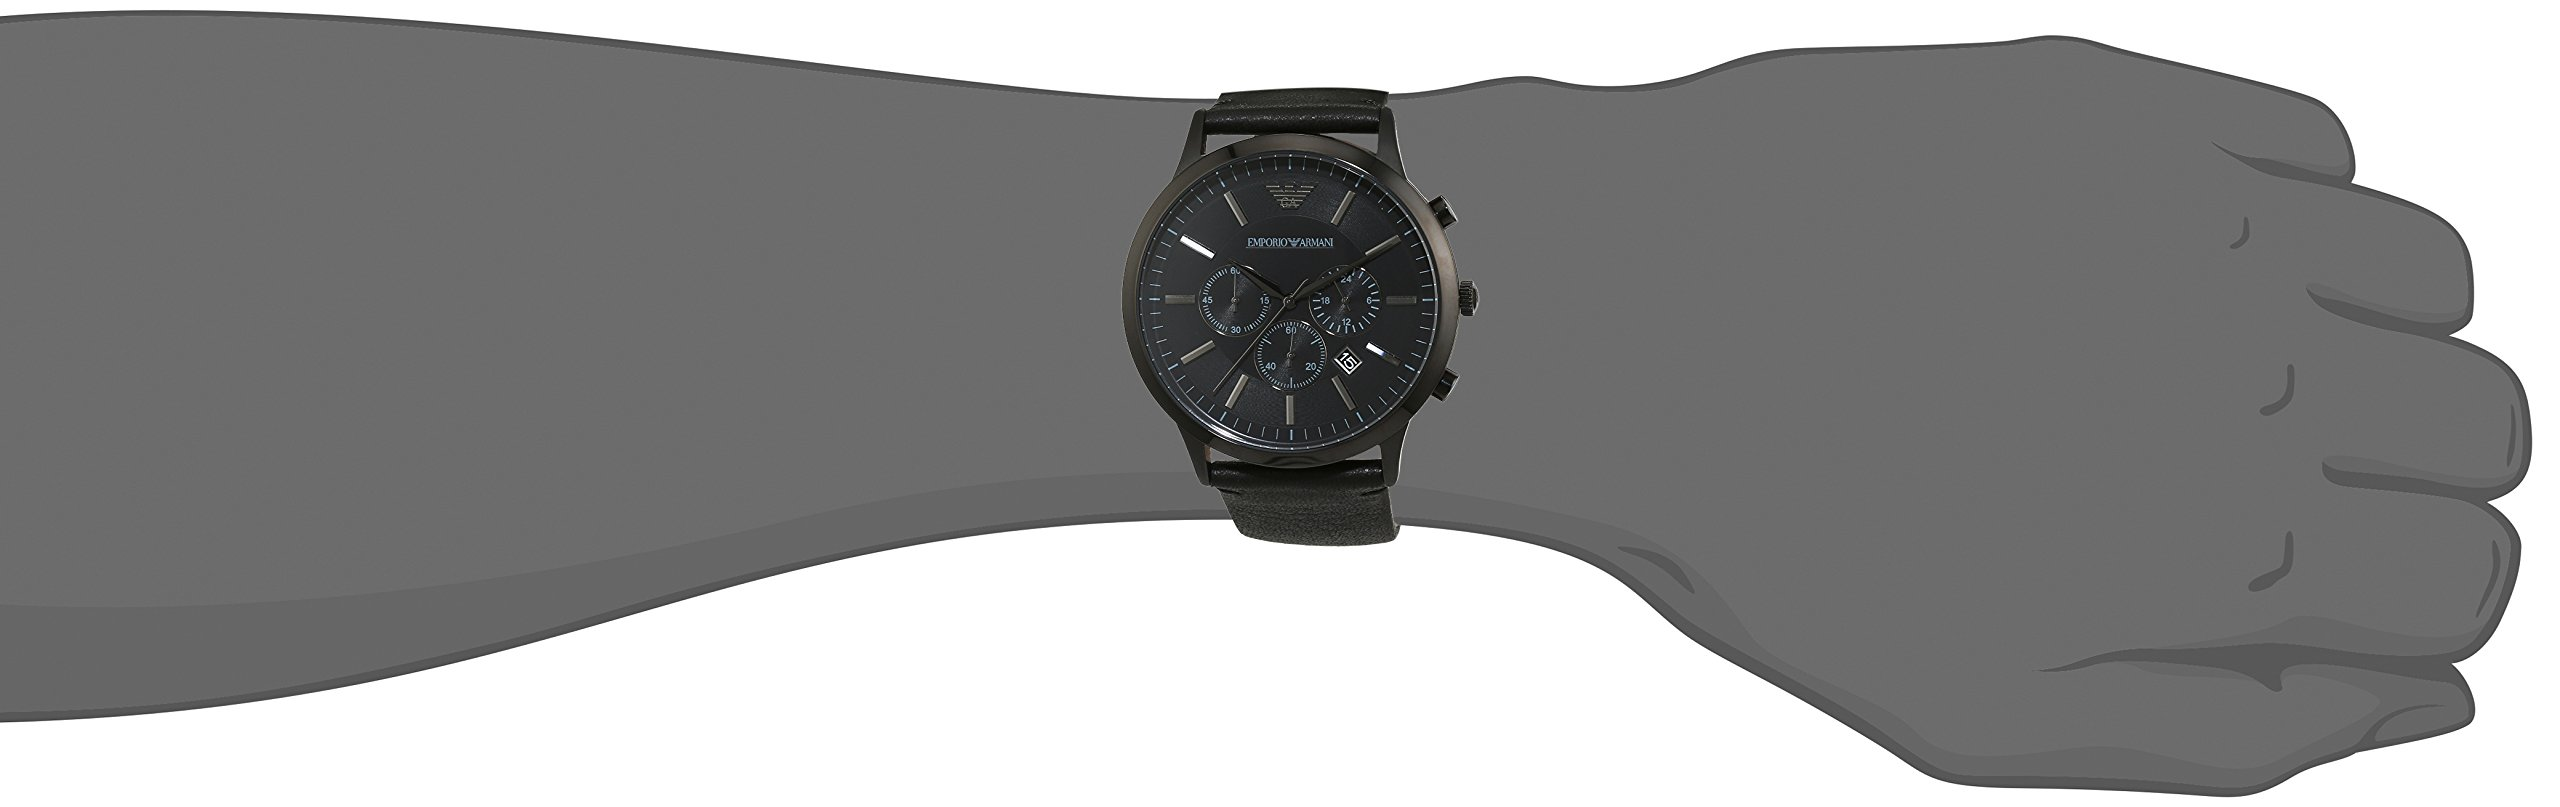 Emporio Armani Sportivo reloj